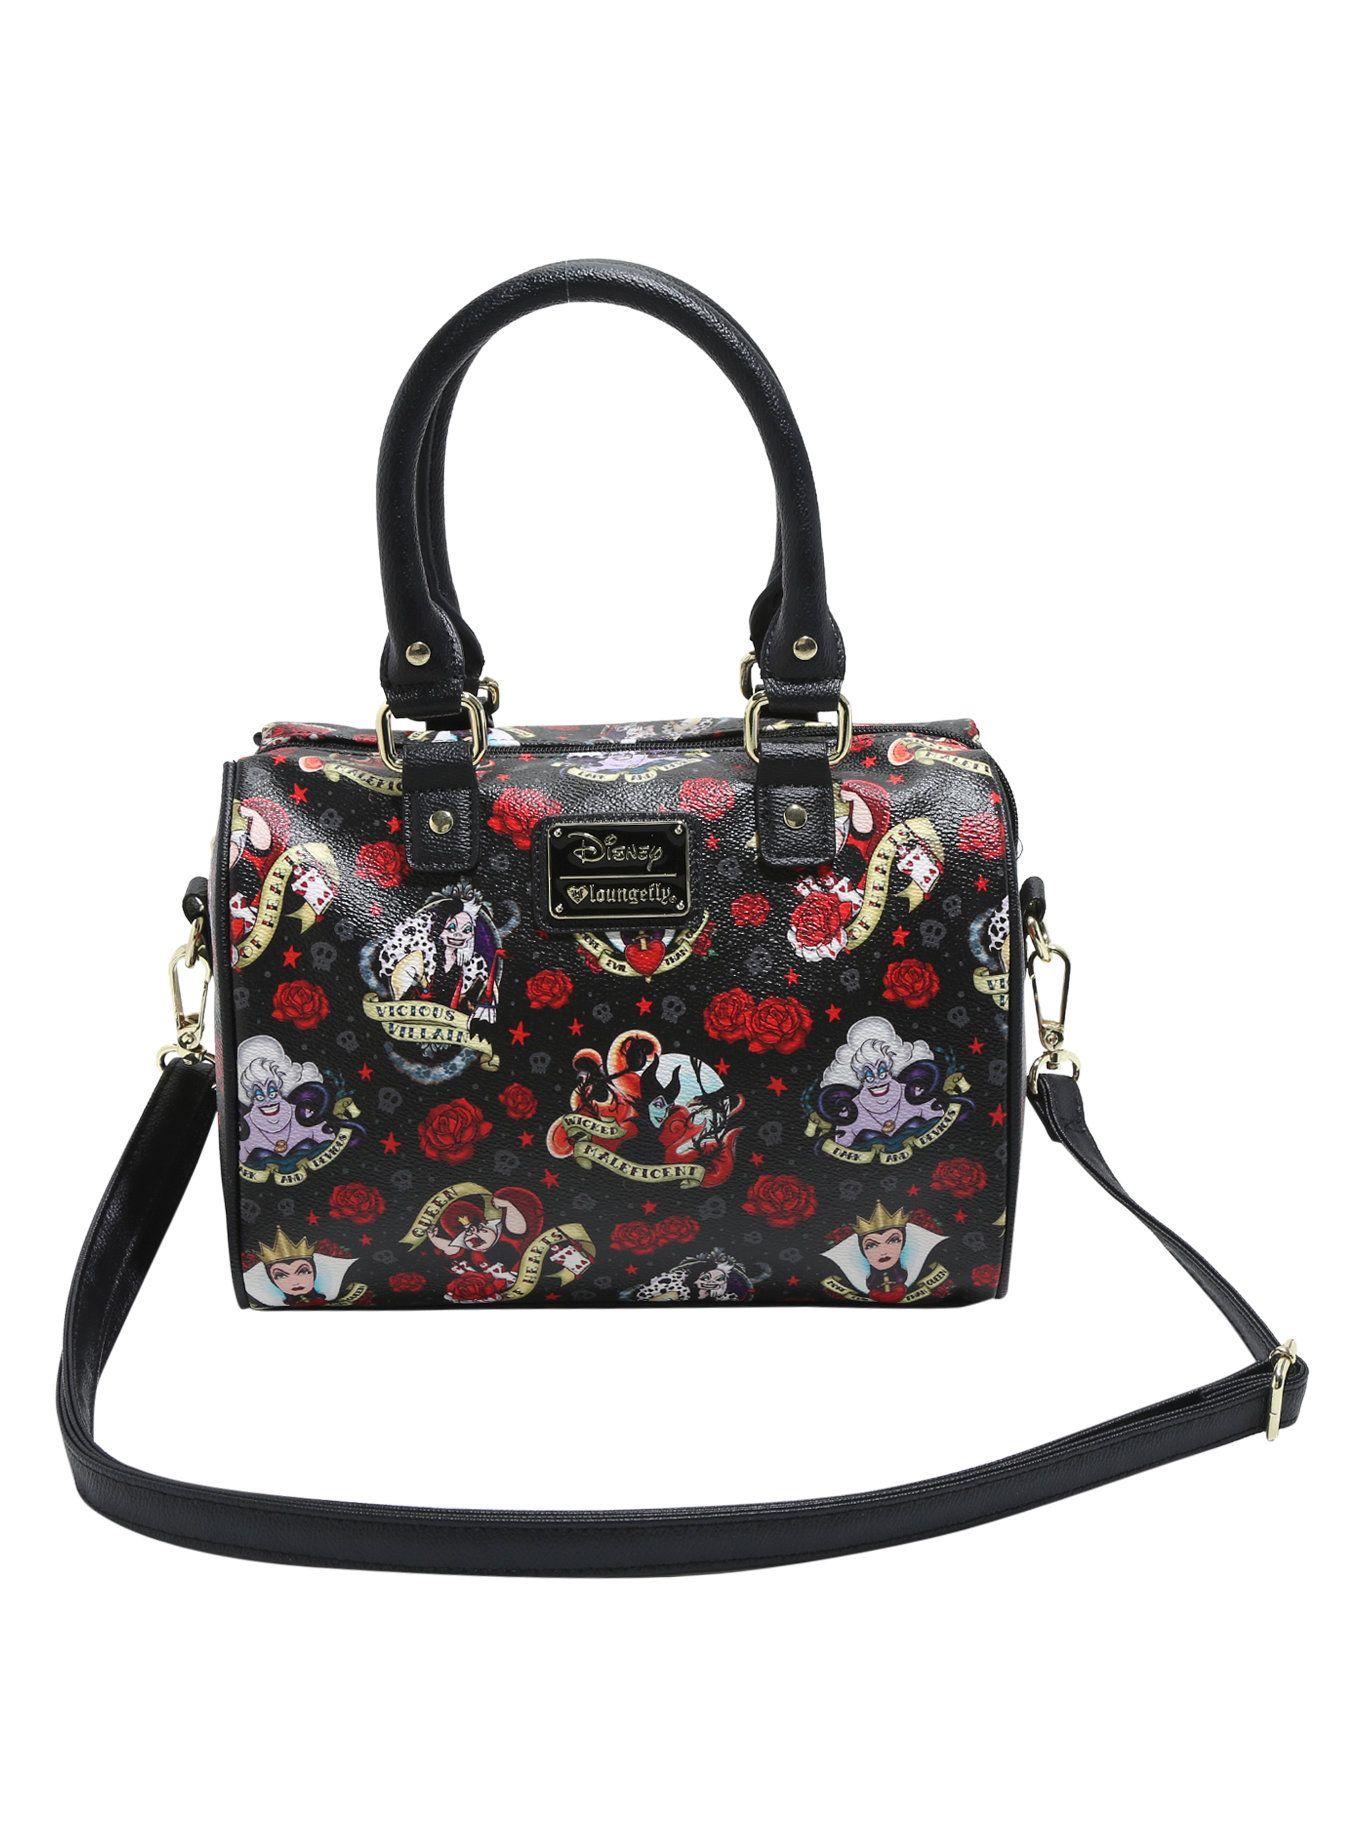 Loungefly Disney Villains Tattoo Flash Barrel Bag